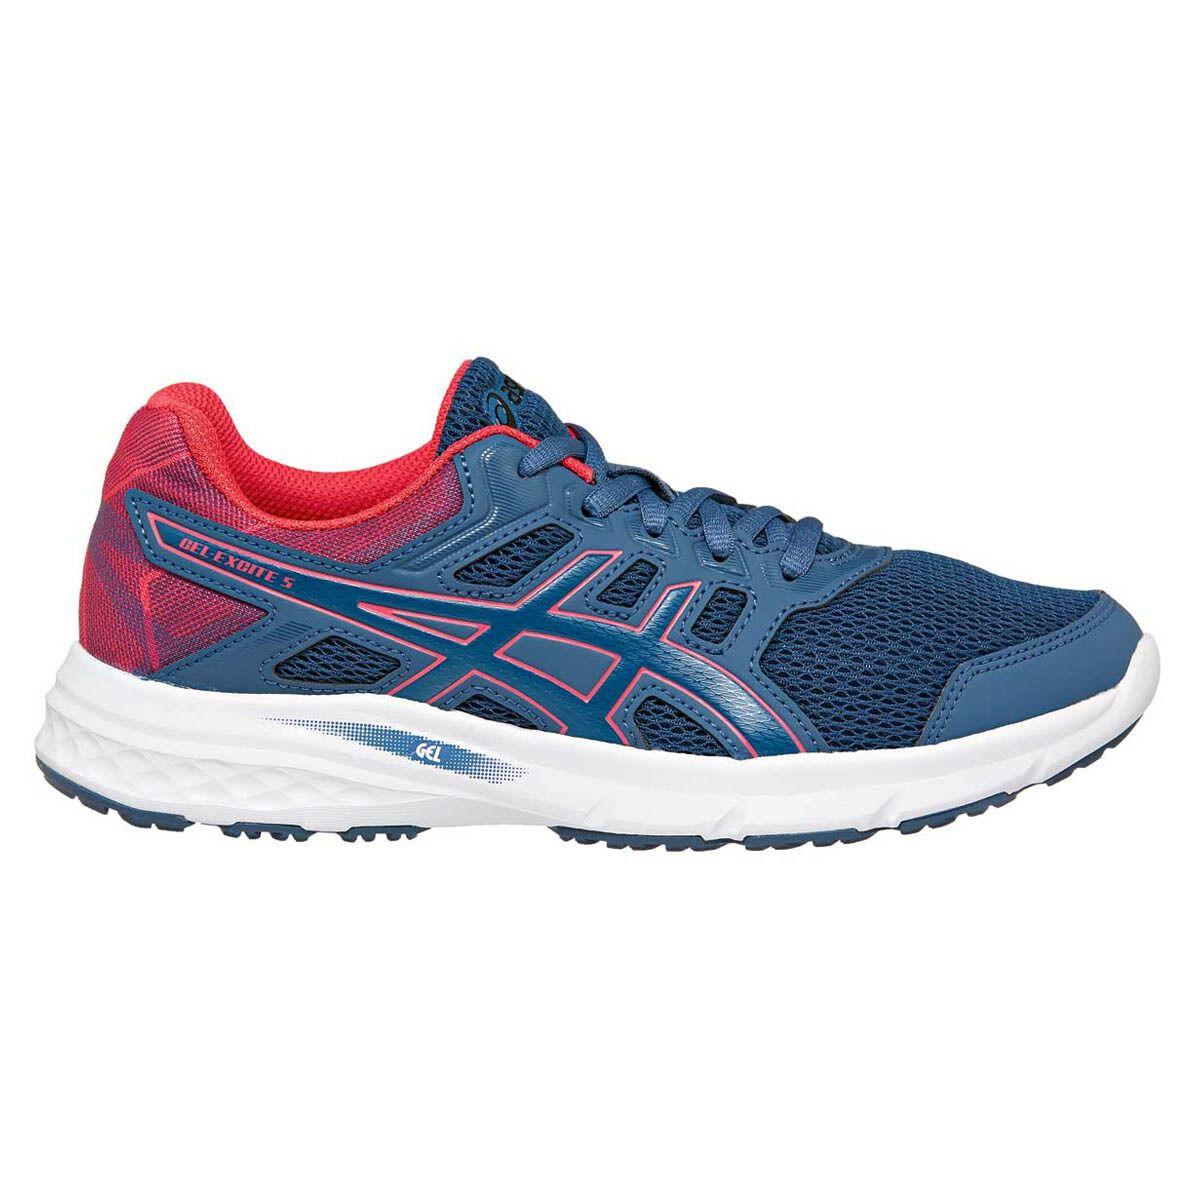 Cheap Asics Shoes Online Usa